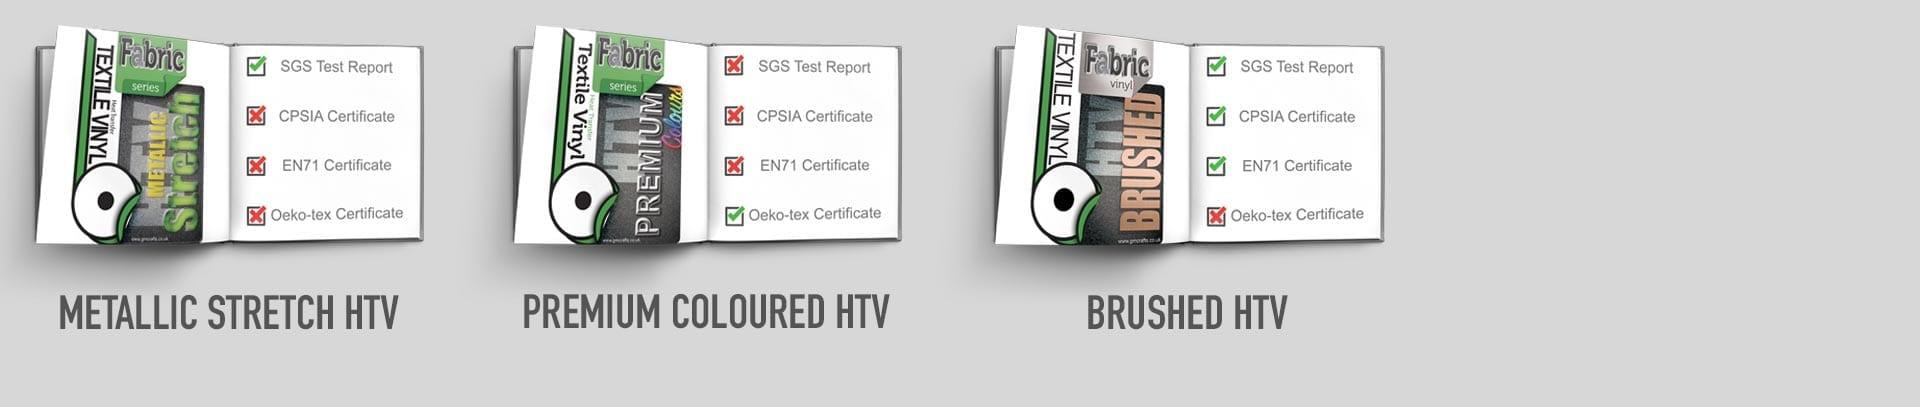 Desktop-HTV-Certificates-3